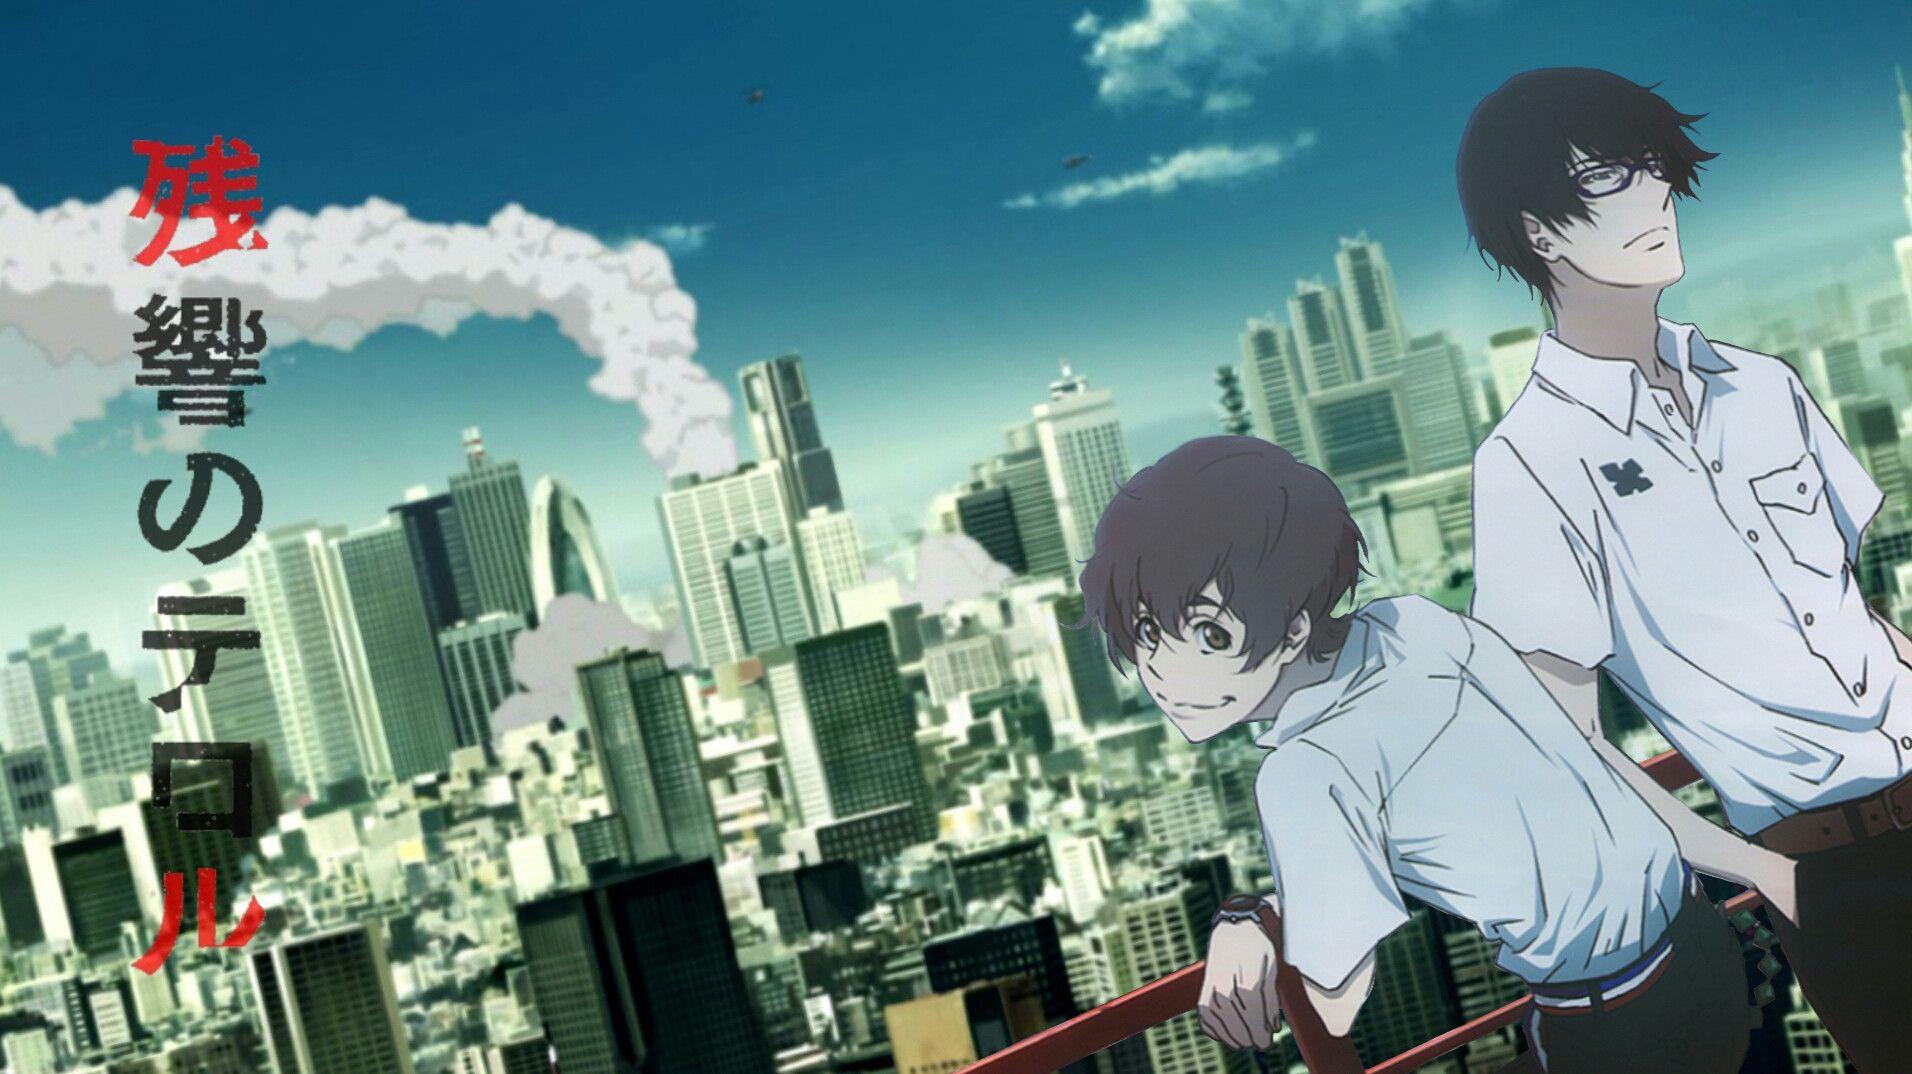 Anime Girl Wallpaper With Names Zankyou No Terror Anime Wallpapers Hd 4k Download For